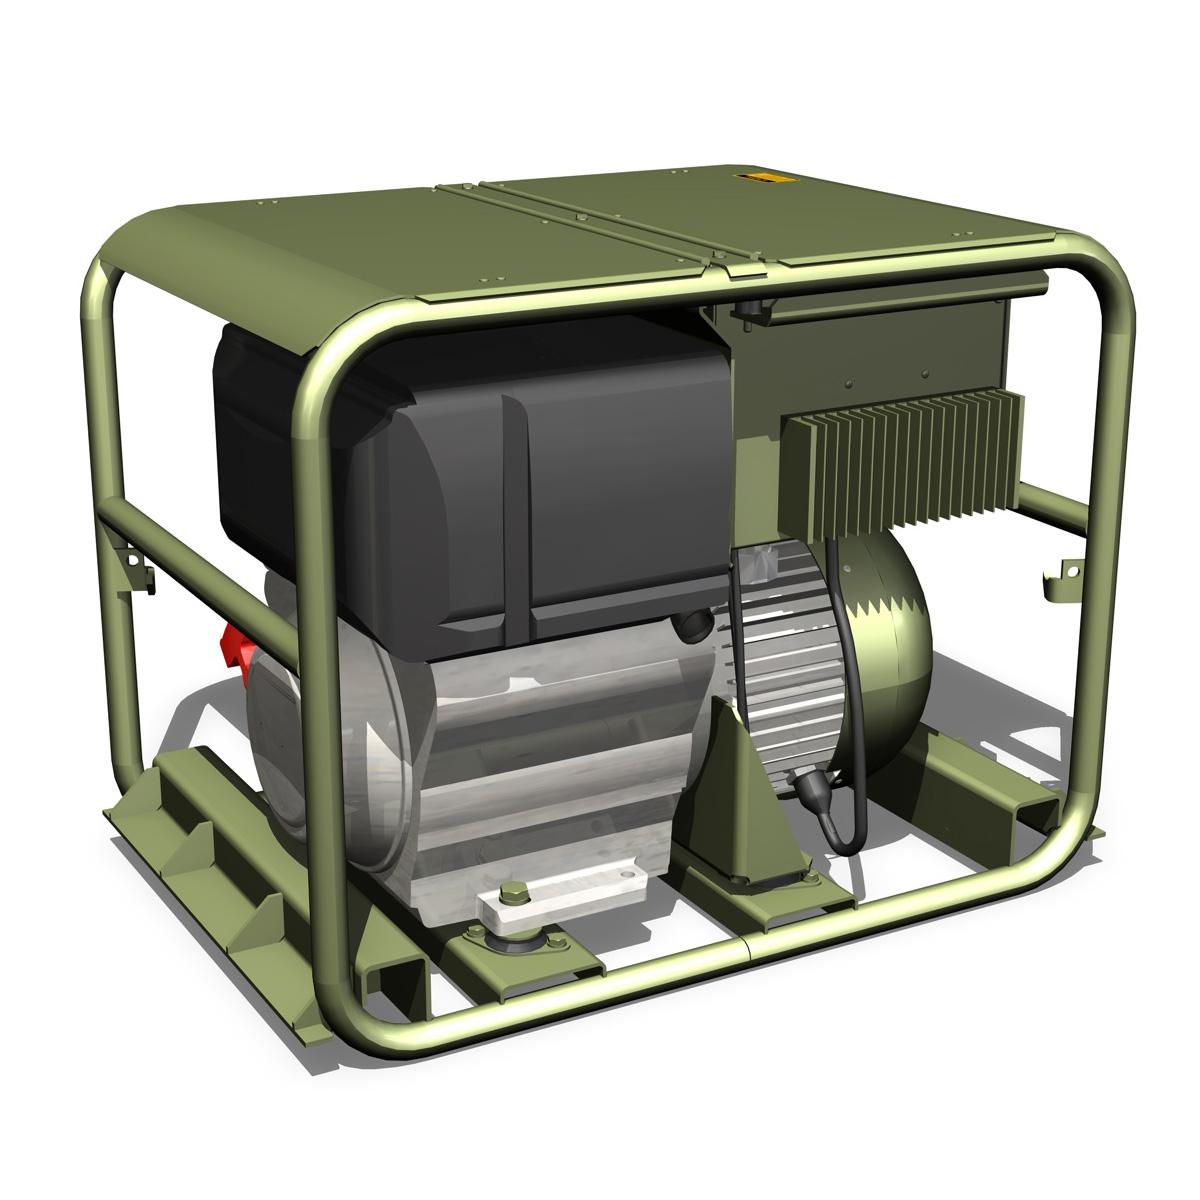 military diesel generator 3d model 3ds fbx c4d lwo obj 188558